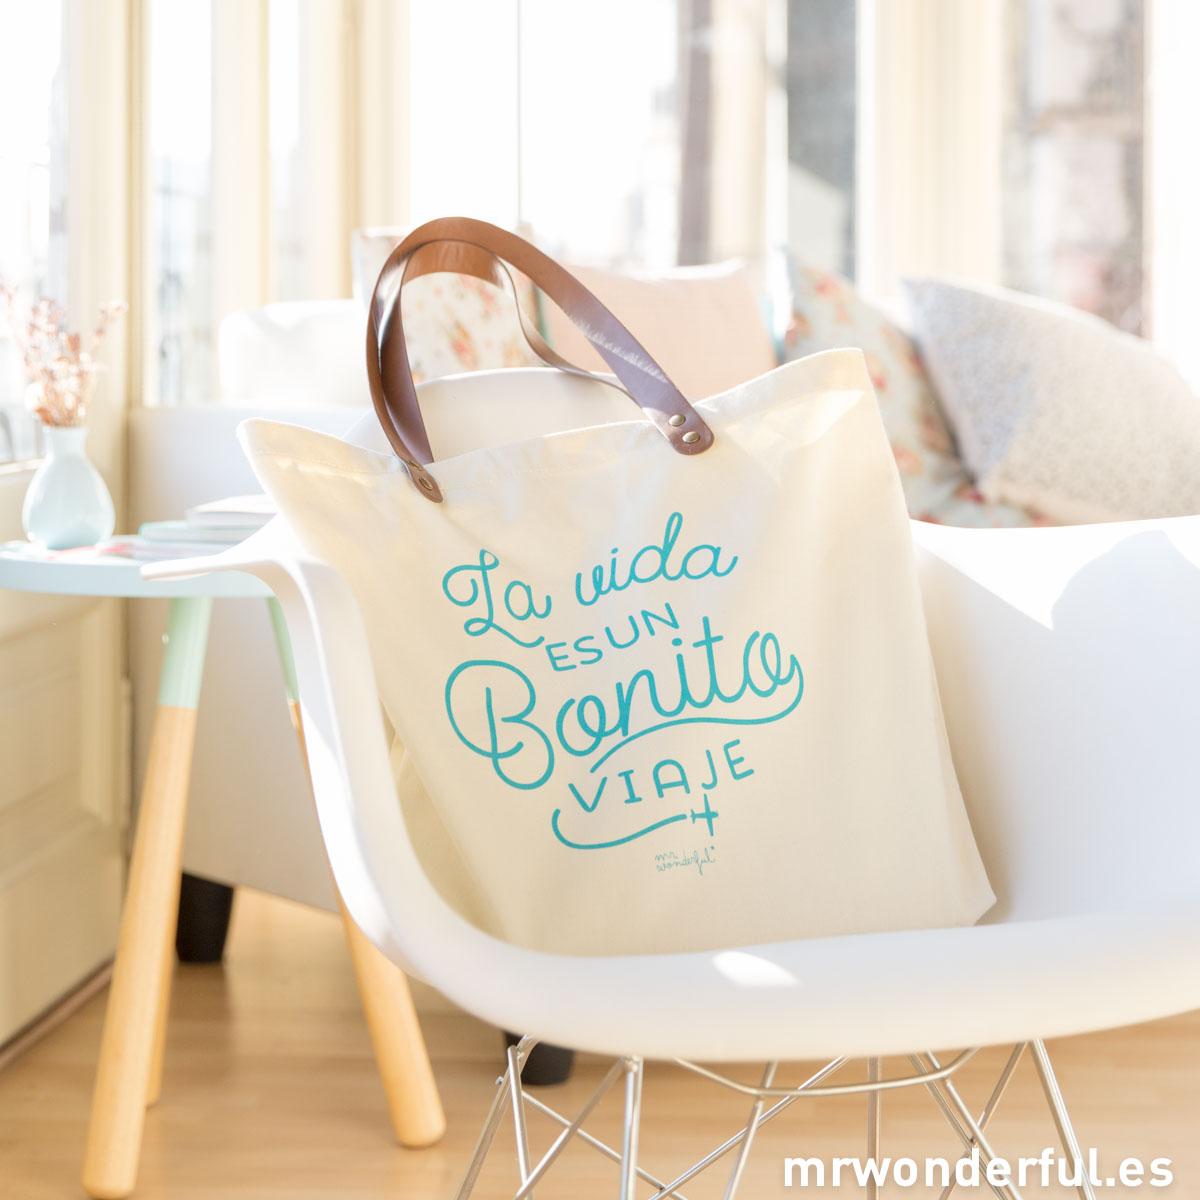 mrwonderful_totebag-la-vida-es-un-bonito-viaje-2015-27